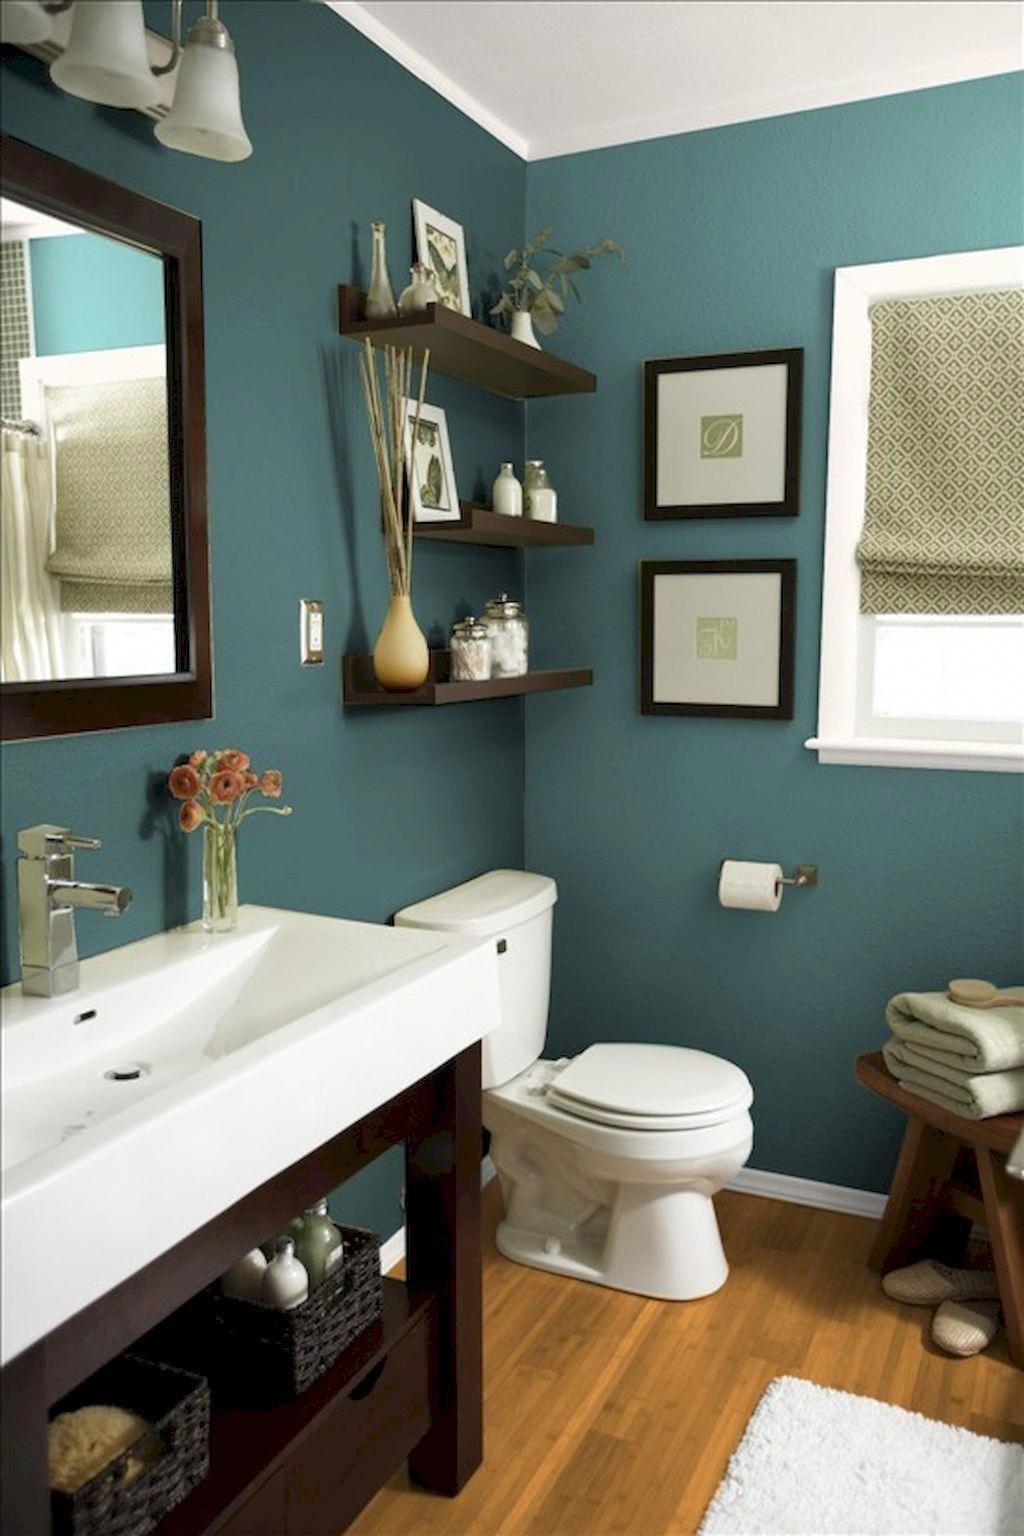 black gold bathroom ideas tealandblackbathroomideas